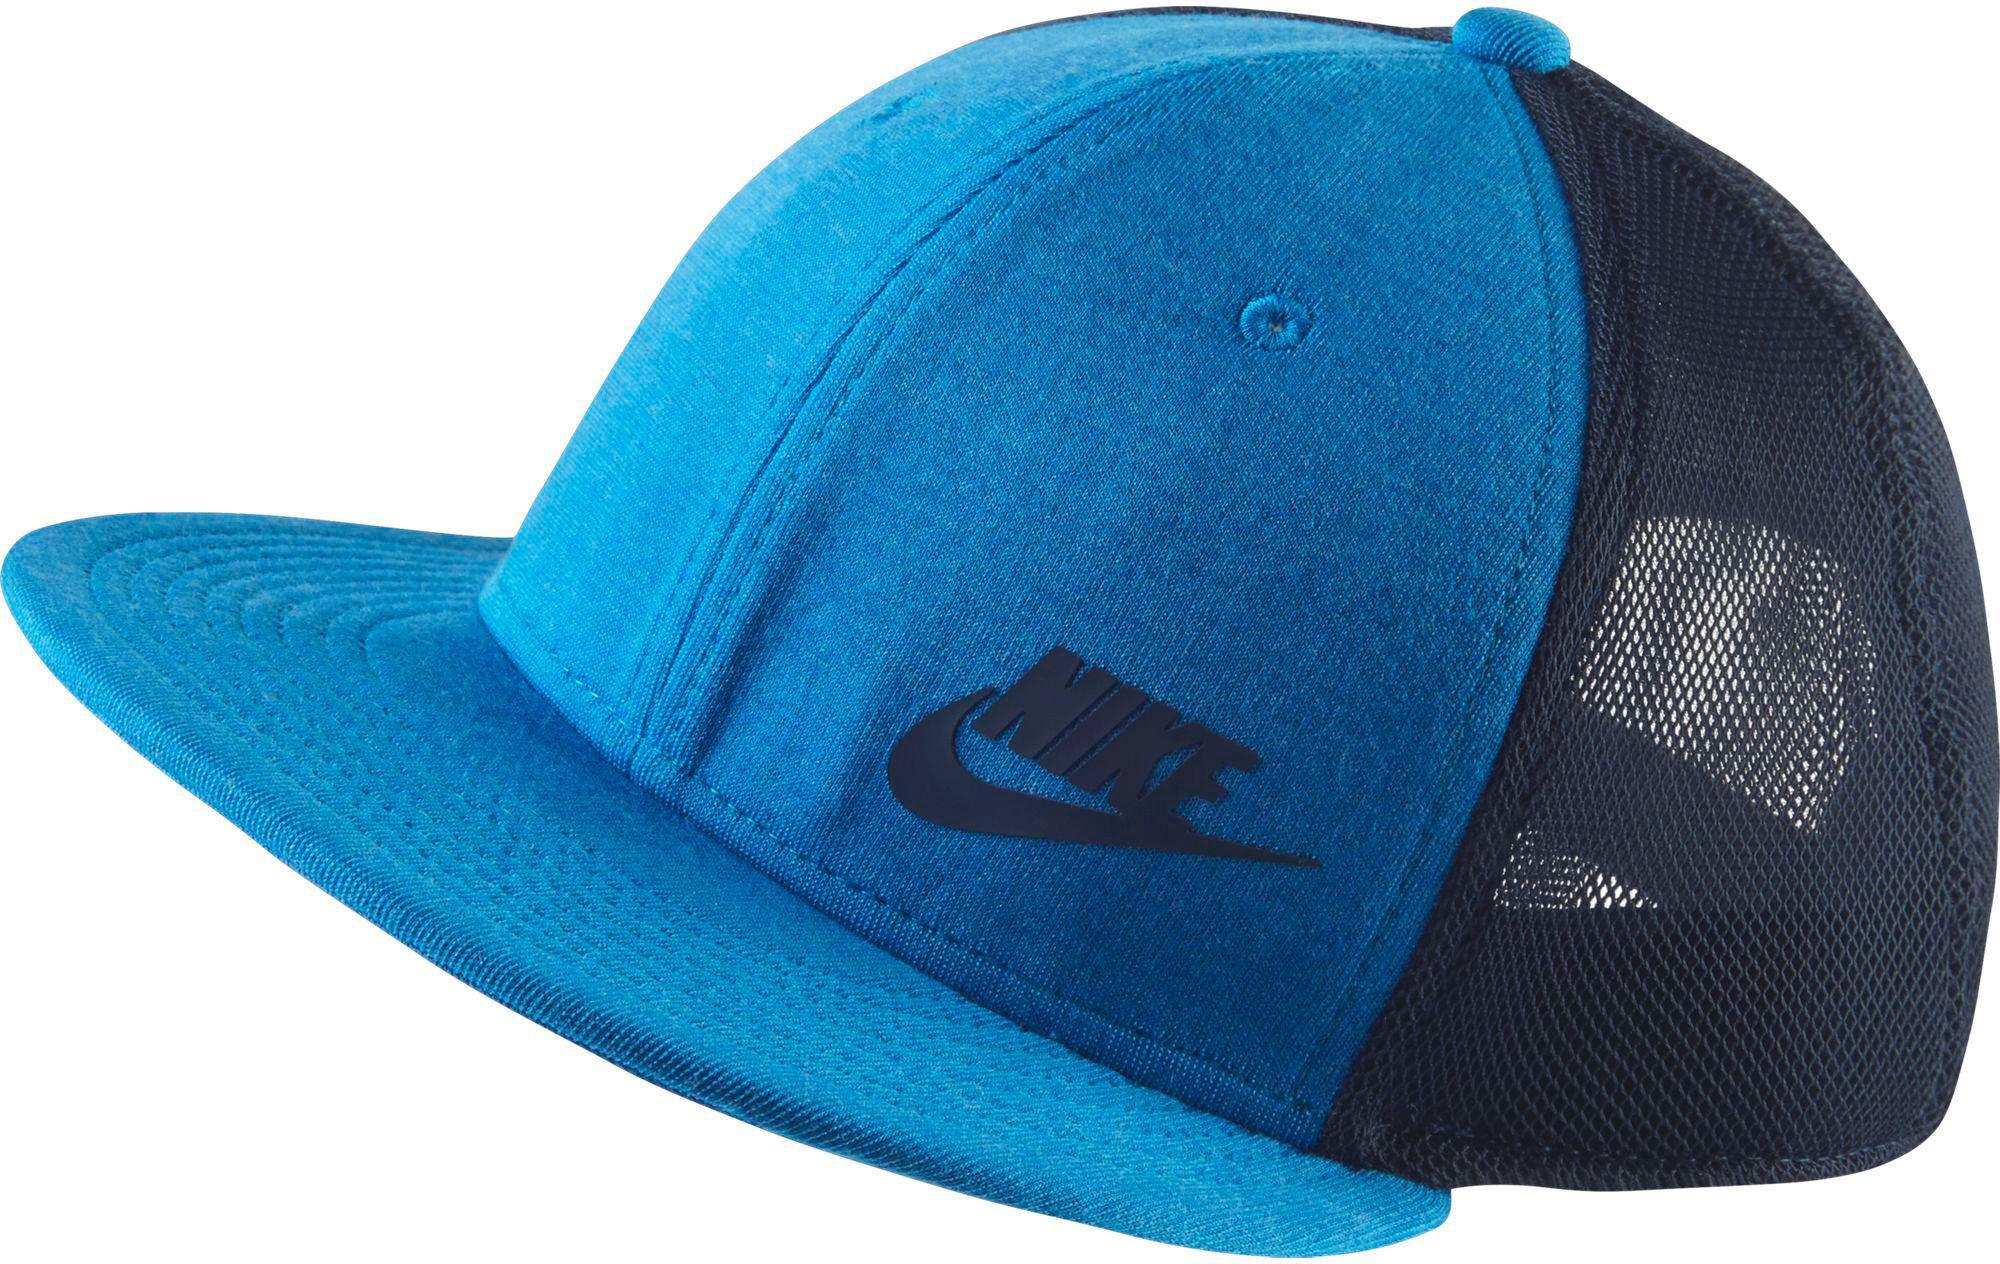 527378bfb Lyst - Nike True Tech Pack Adjustable Snapback Hat in Blue for Men